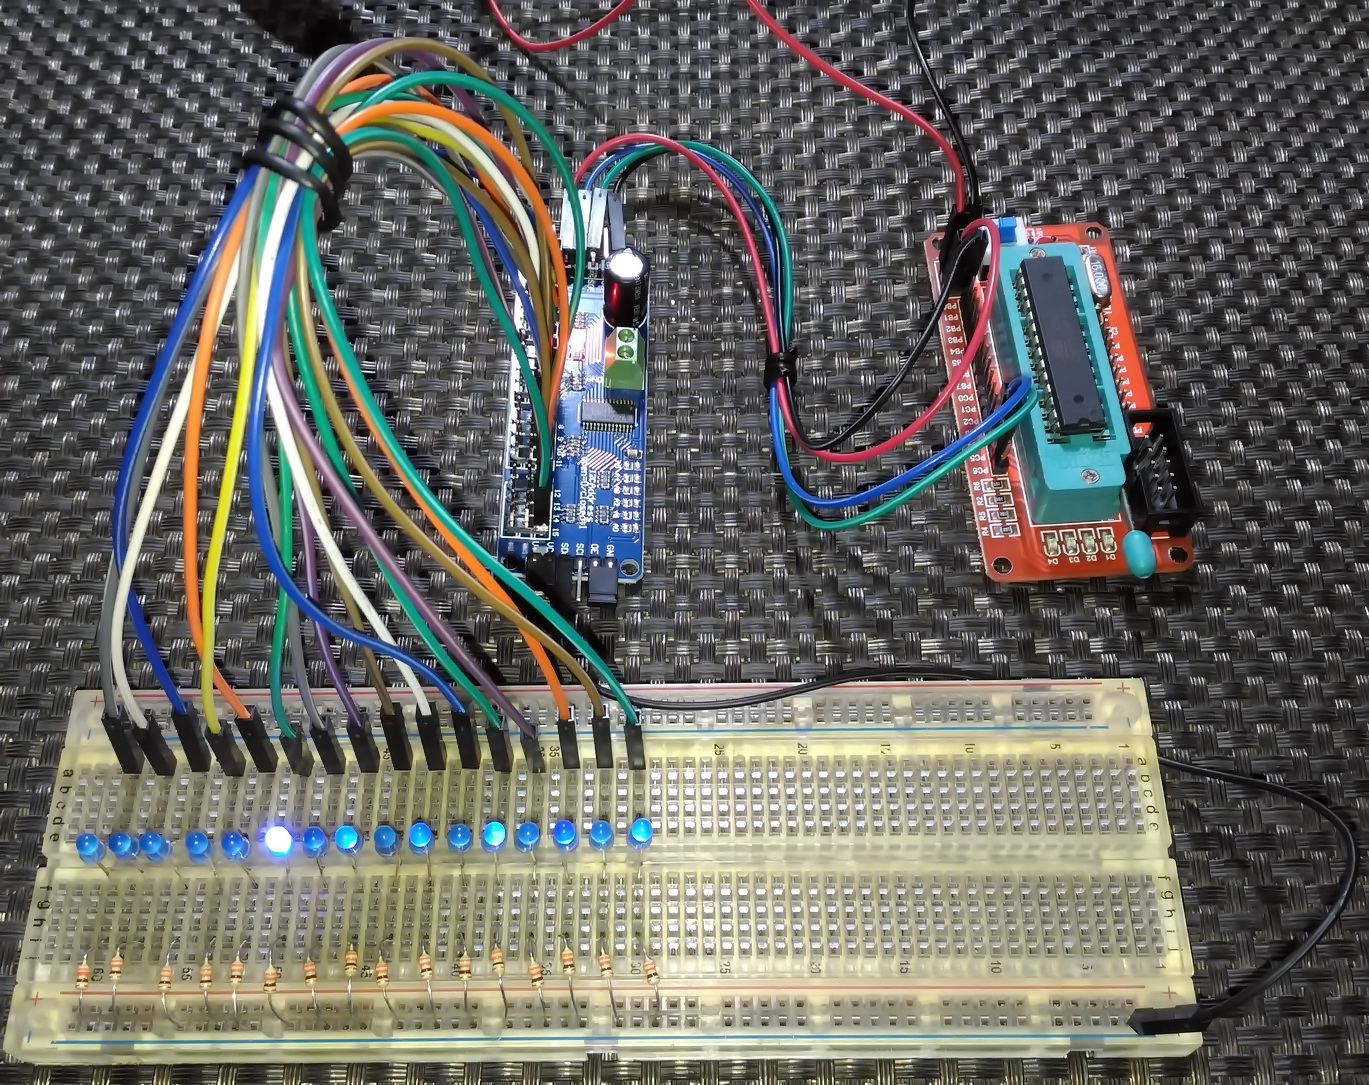 LibStock - PCA9685 16-Channel 12-bit PWM Controller Demo